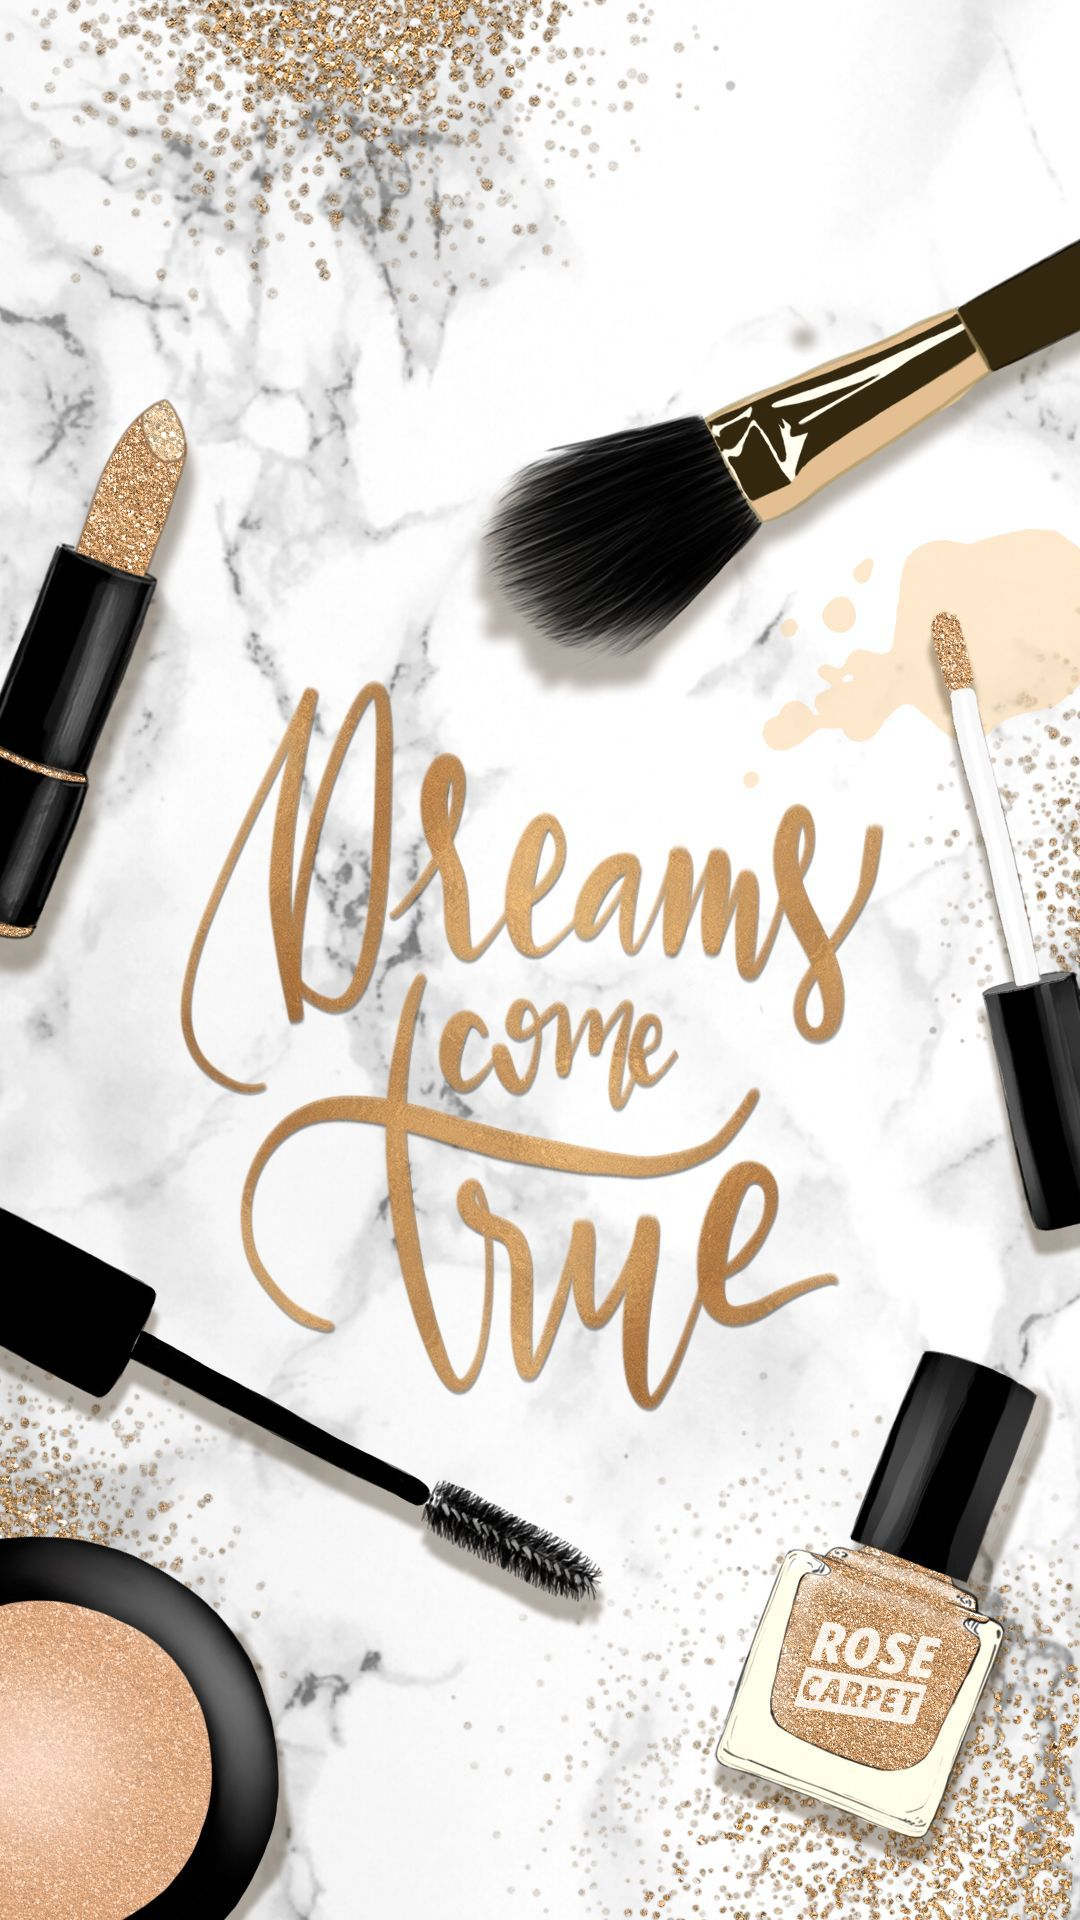 Aesthetic Makeup Background Tumblr Largest Wallpaper Portal